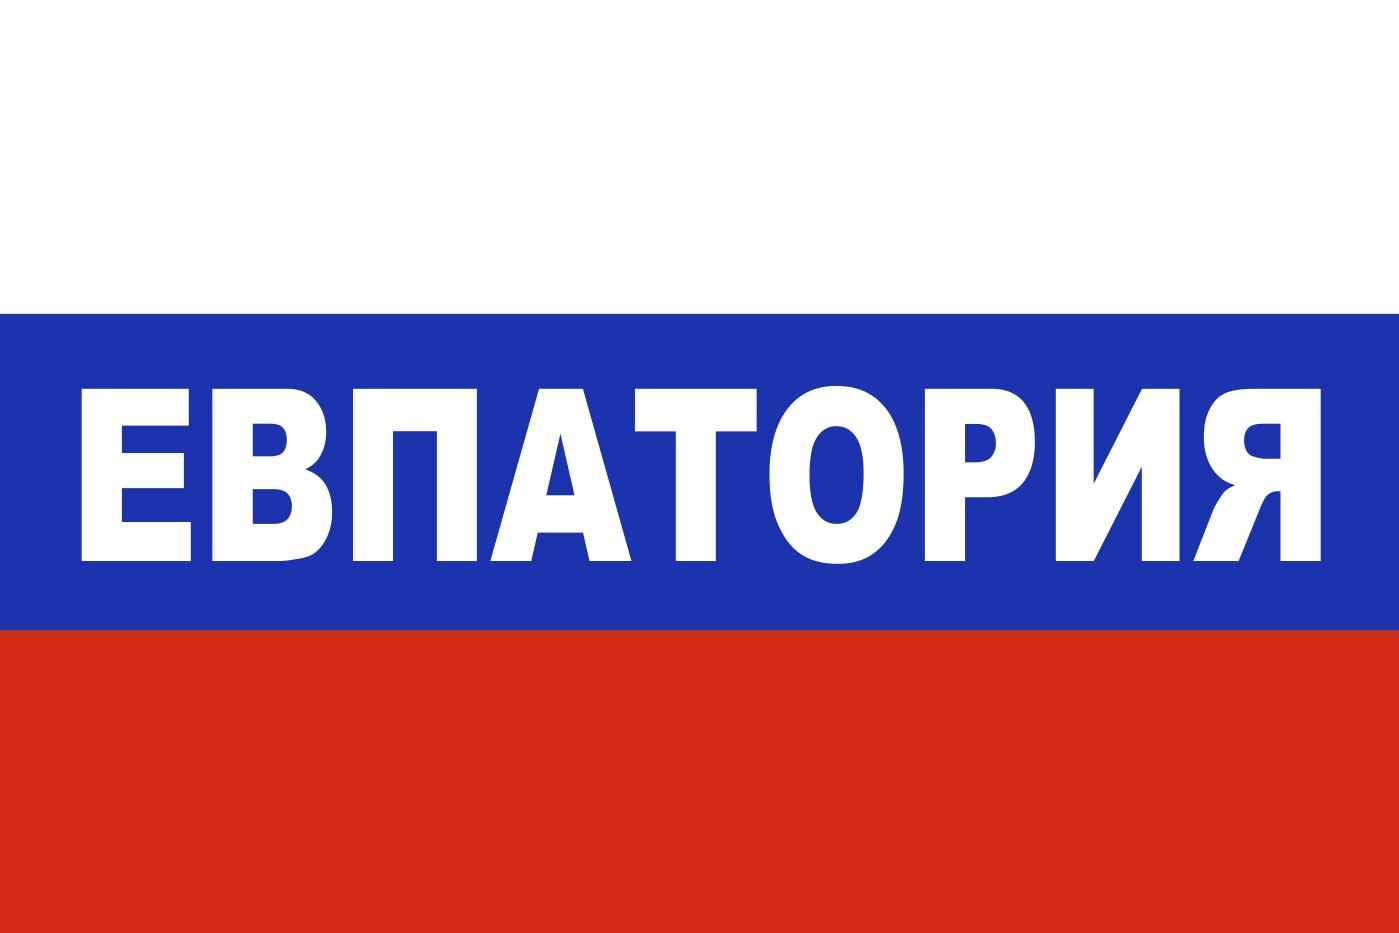 Флаг триколор Евпатория